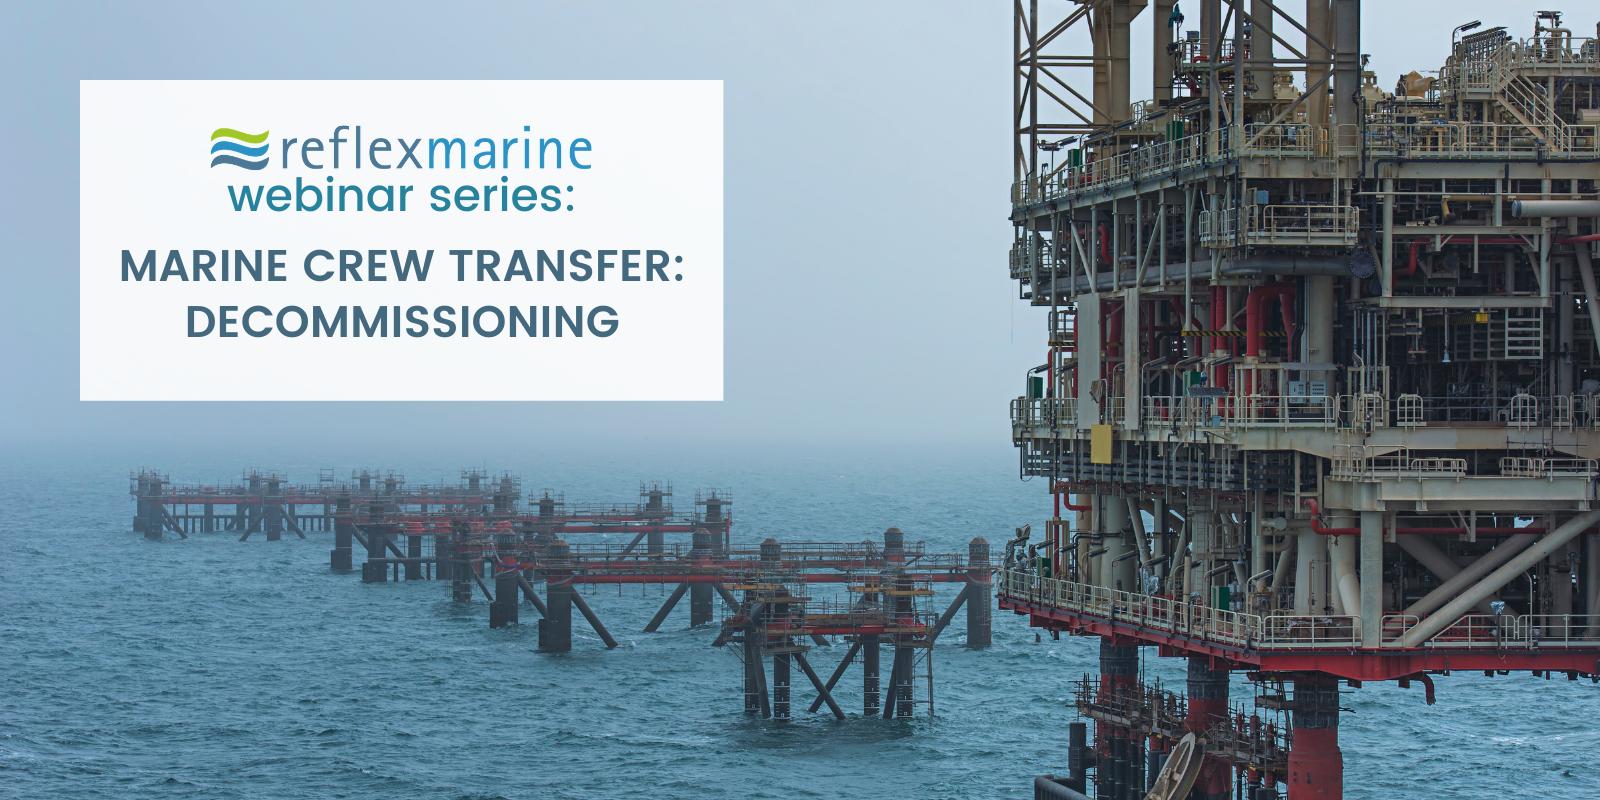 Read Reflex Marine's webinar series Industry focus: Decommissioning (recording)